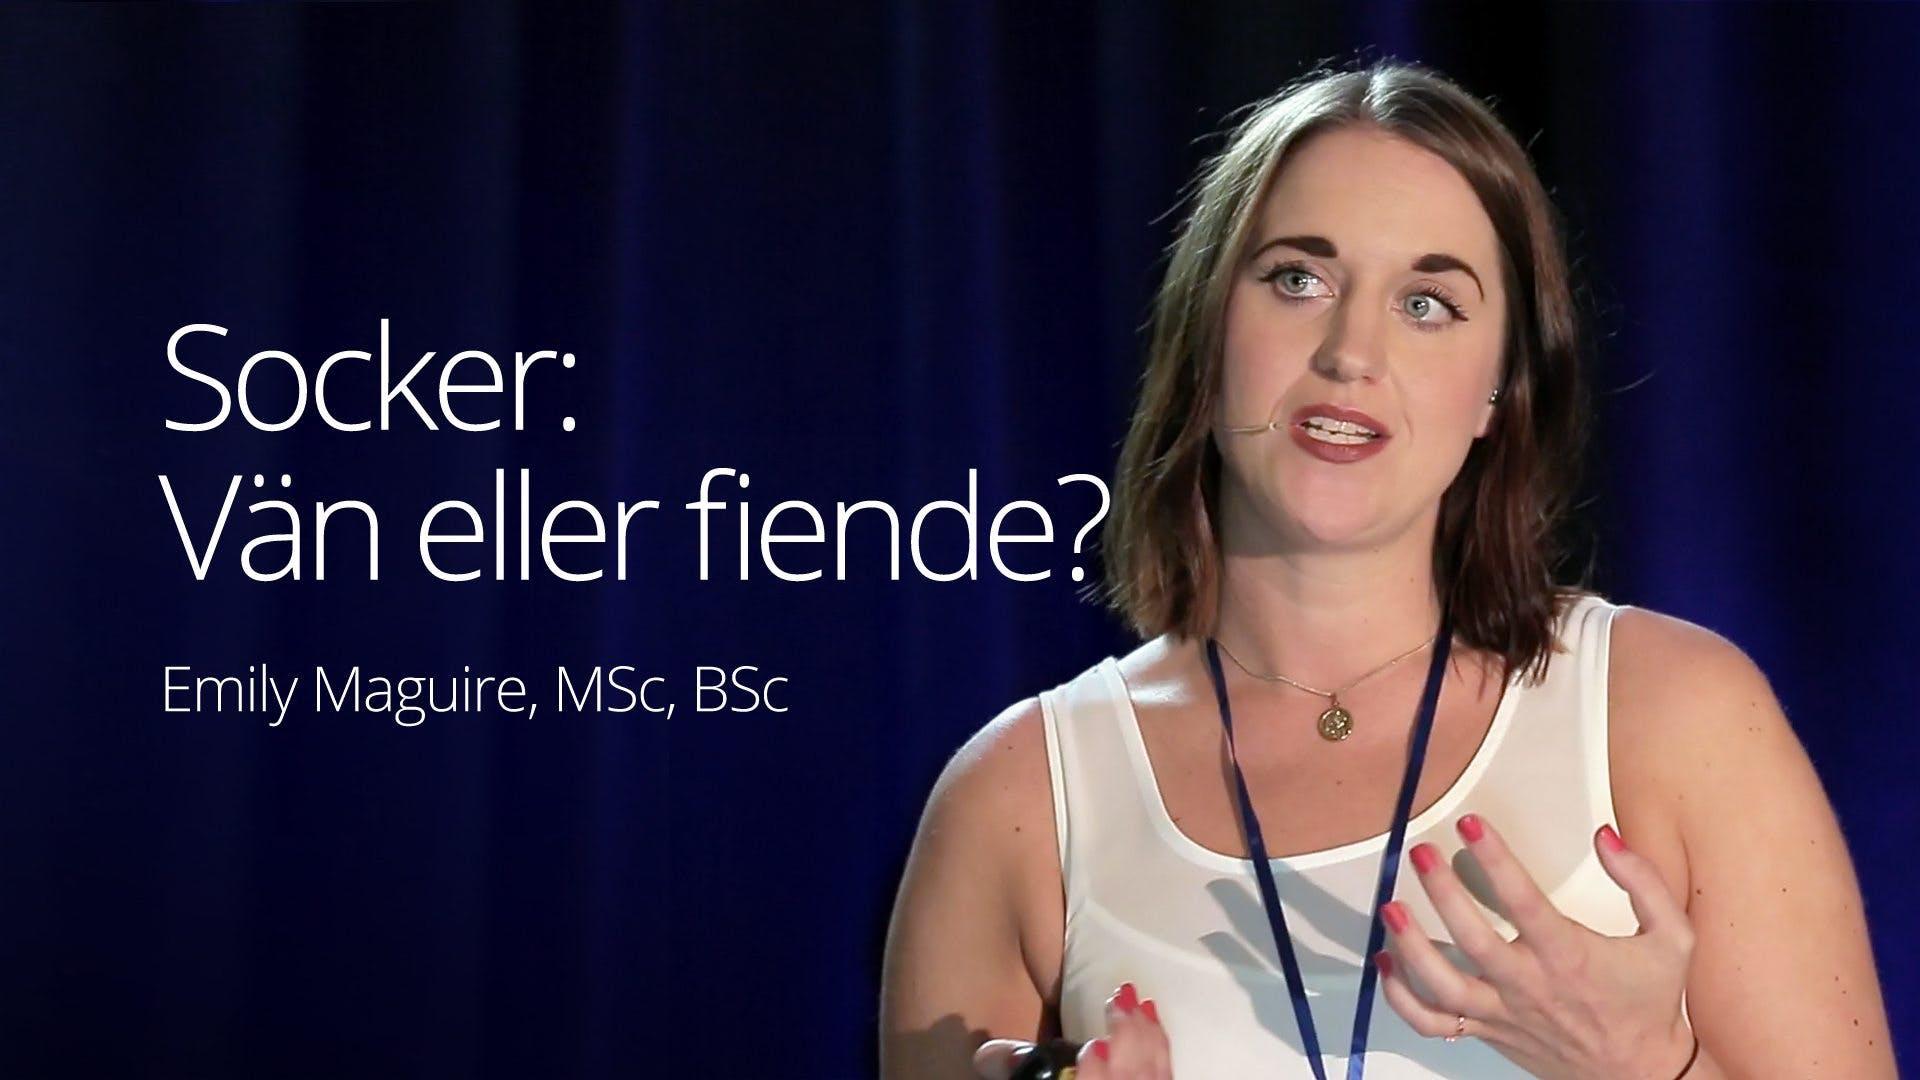 Emily-Maguire-Sugar-Friend-or-Foe?-SD-2016